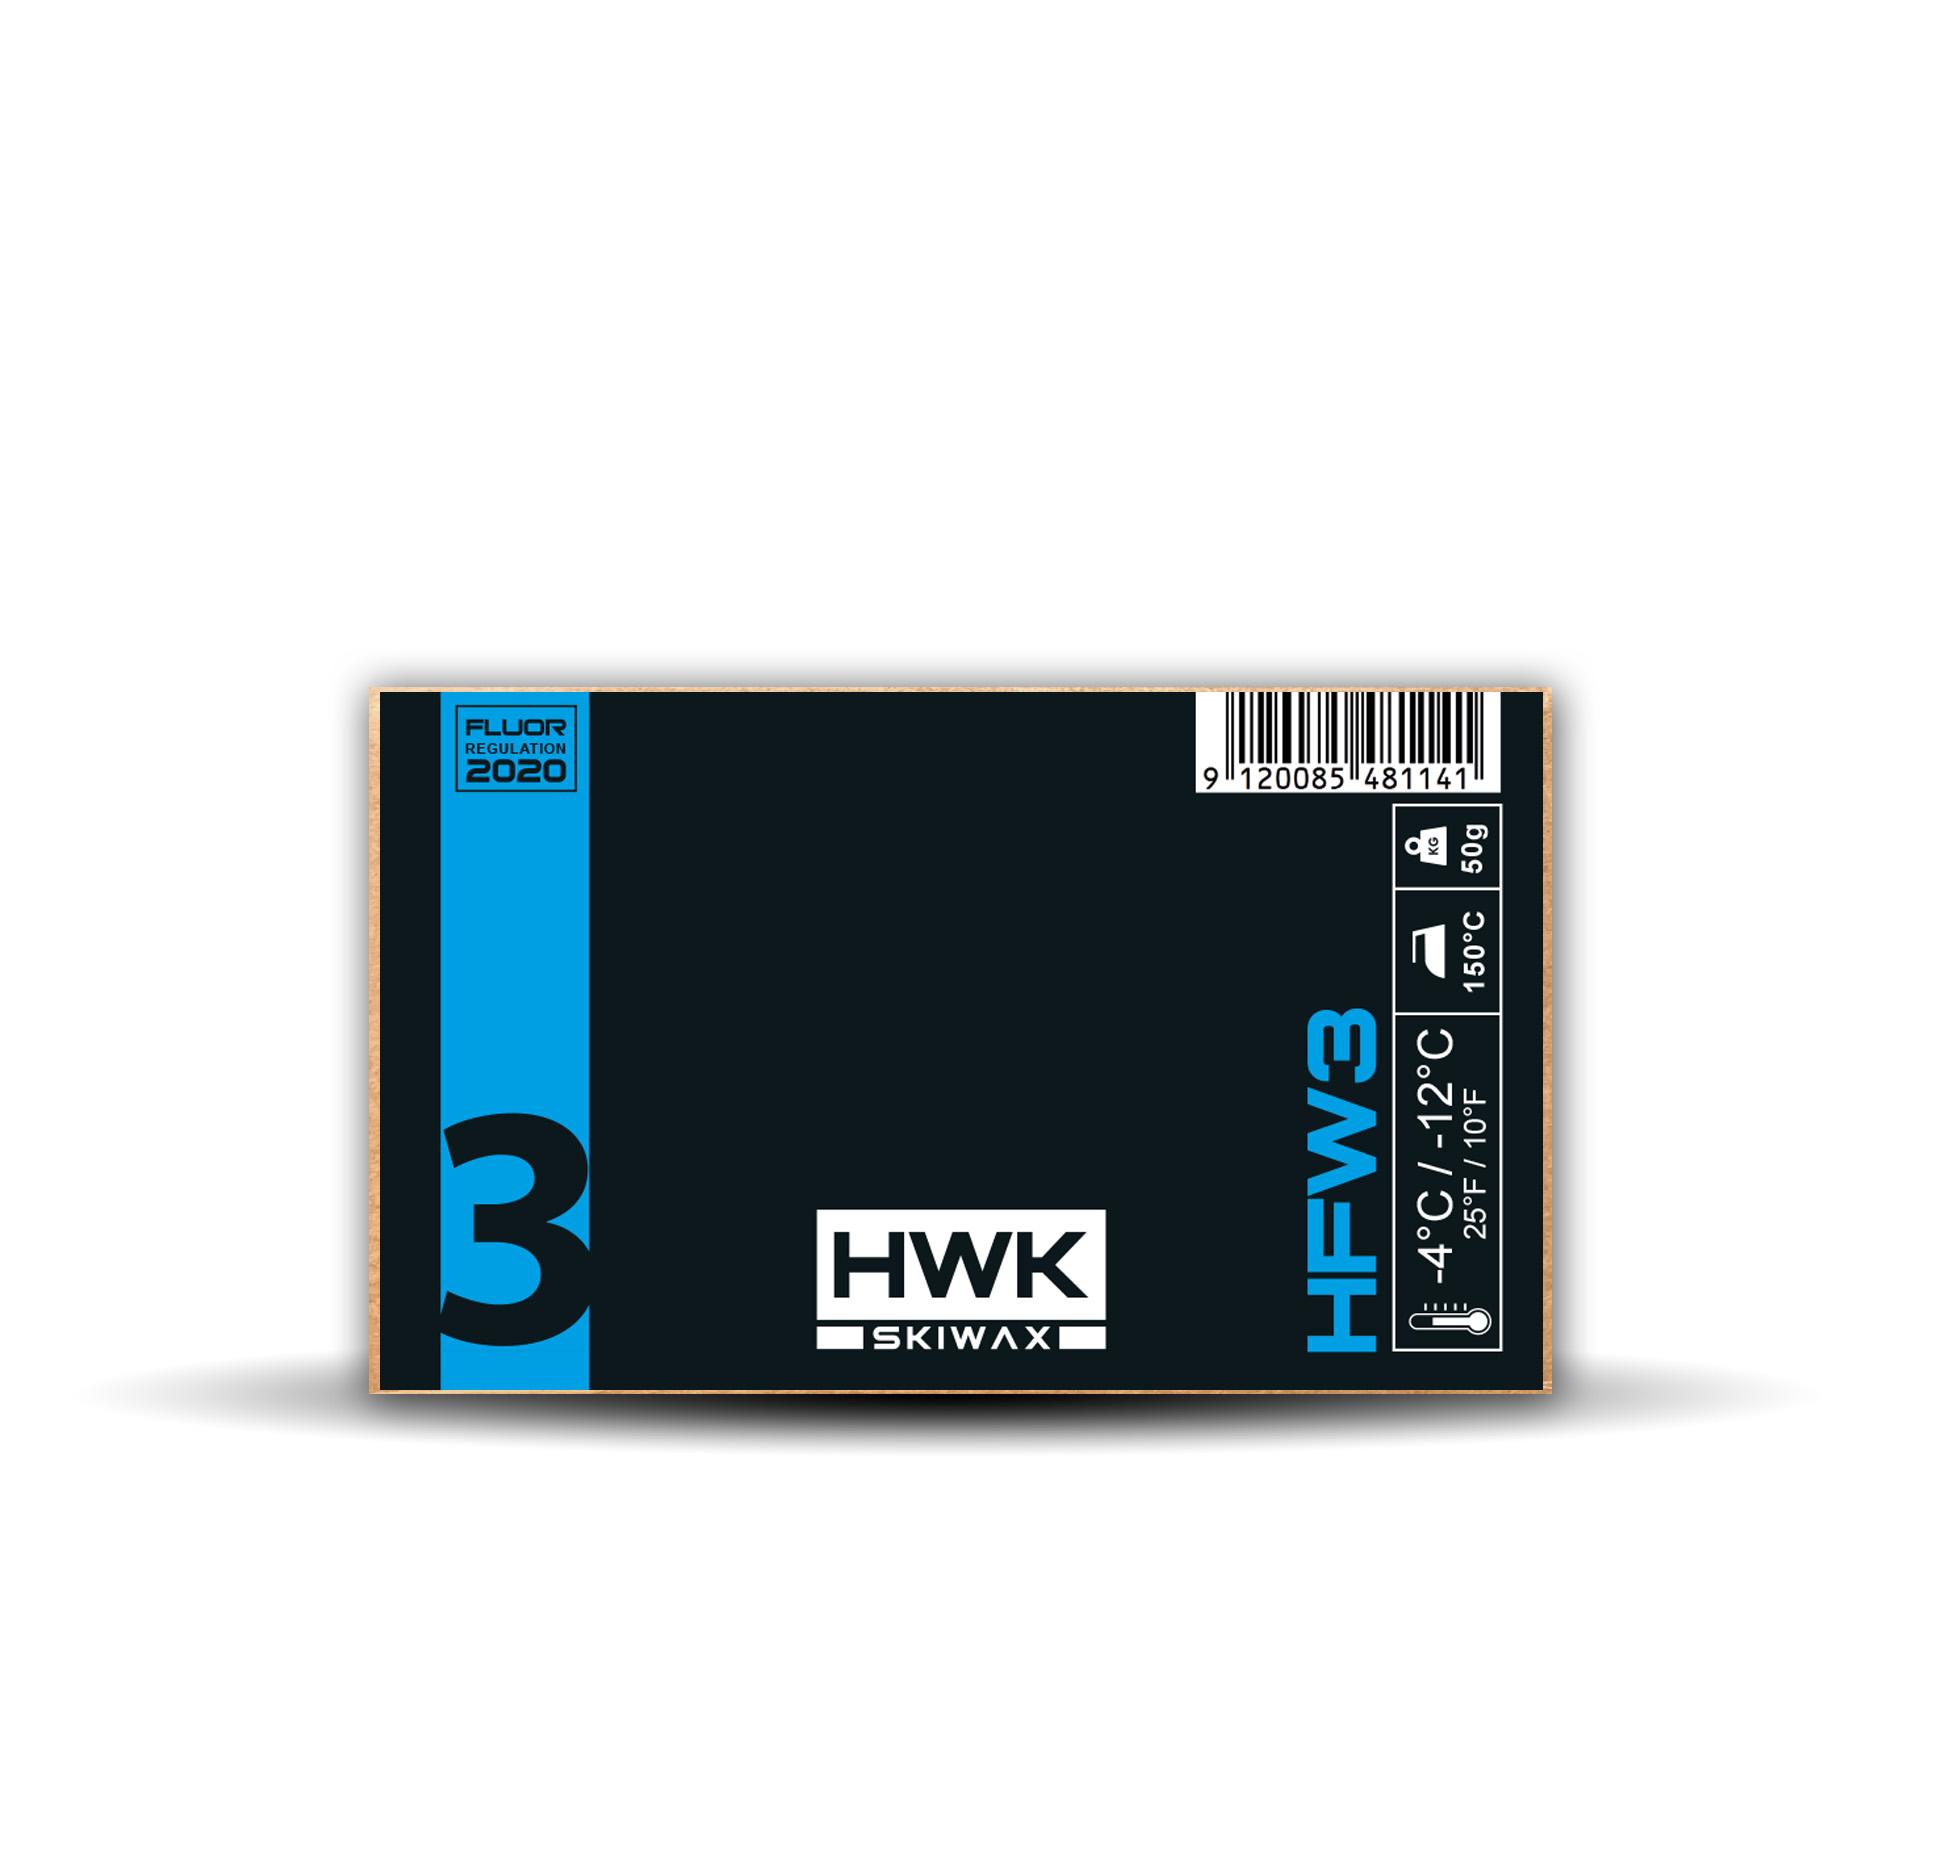 HWK HFW3